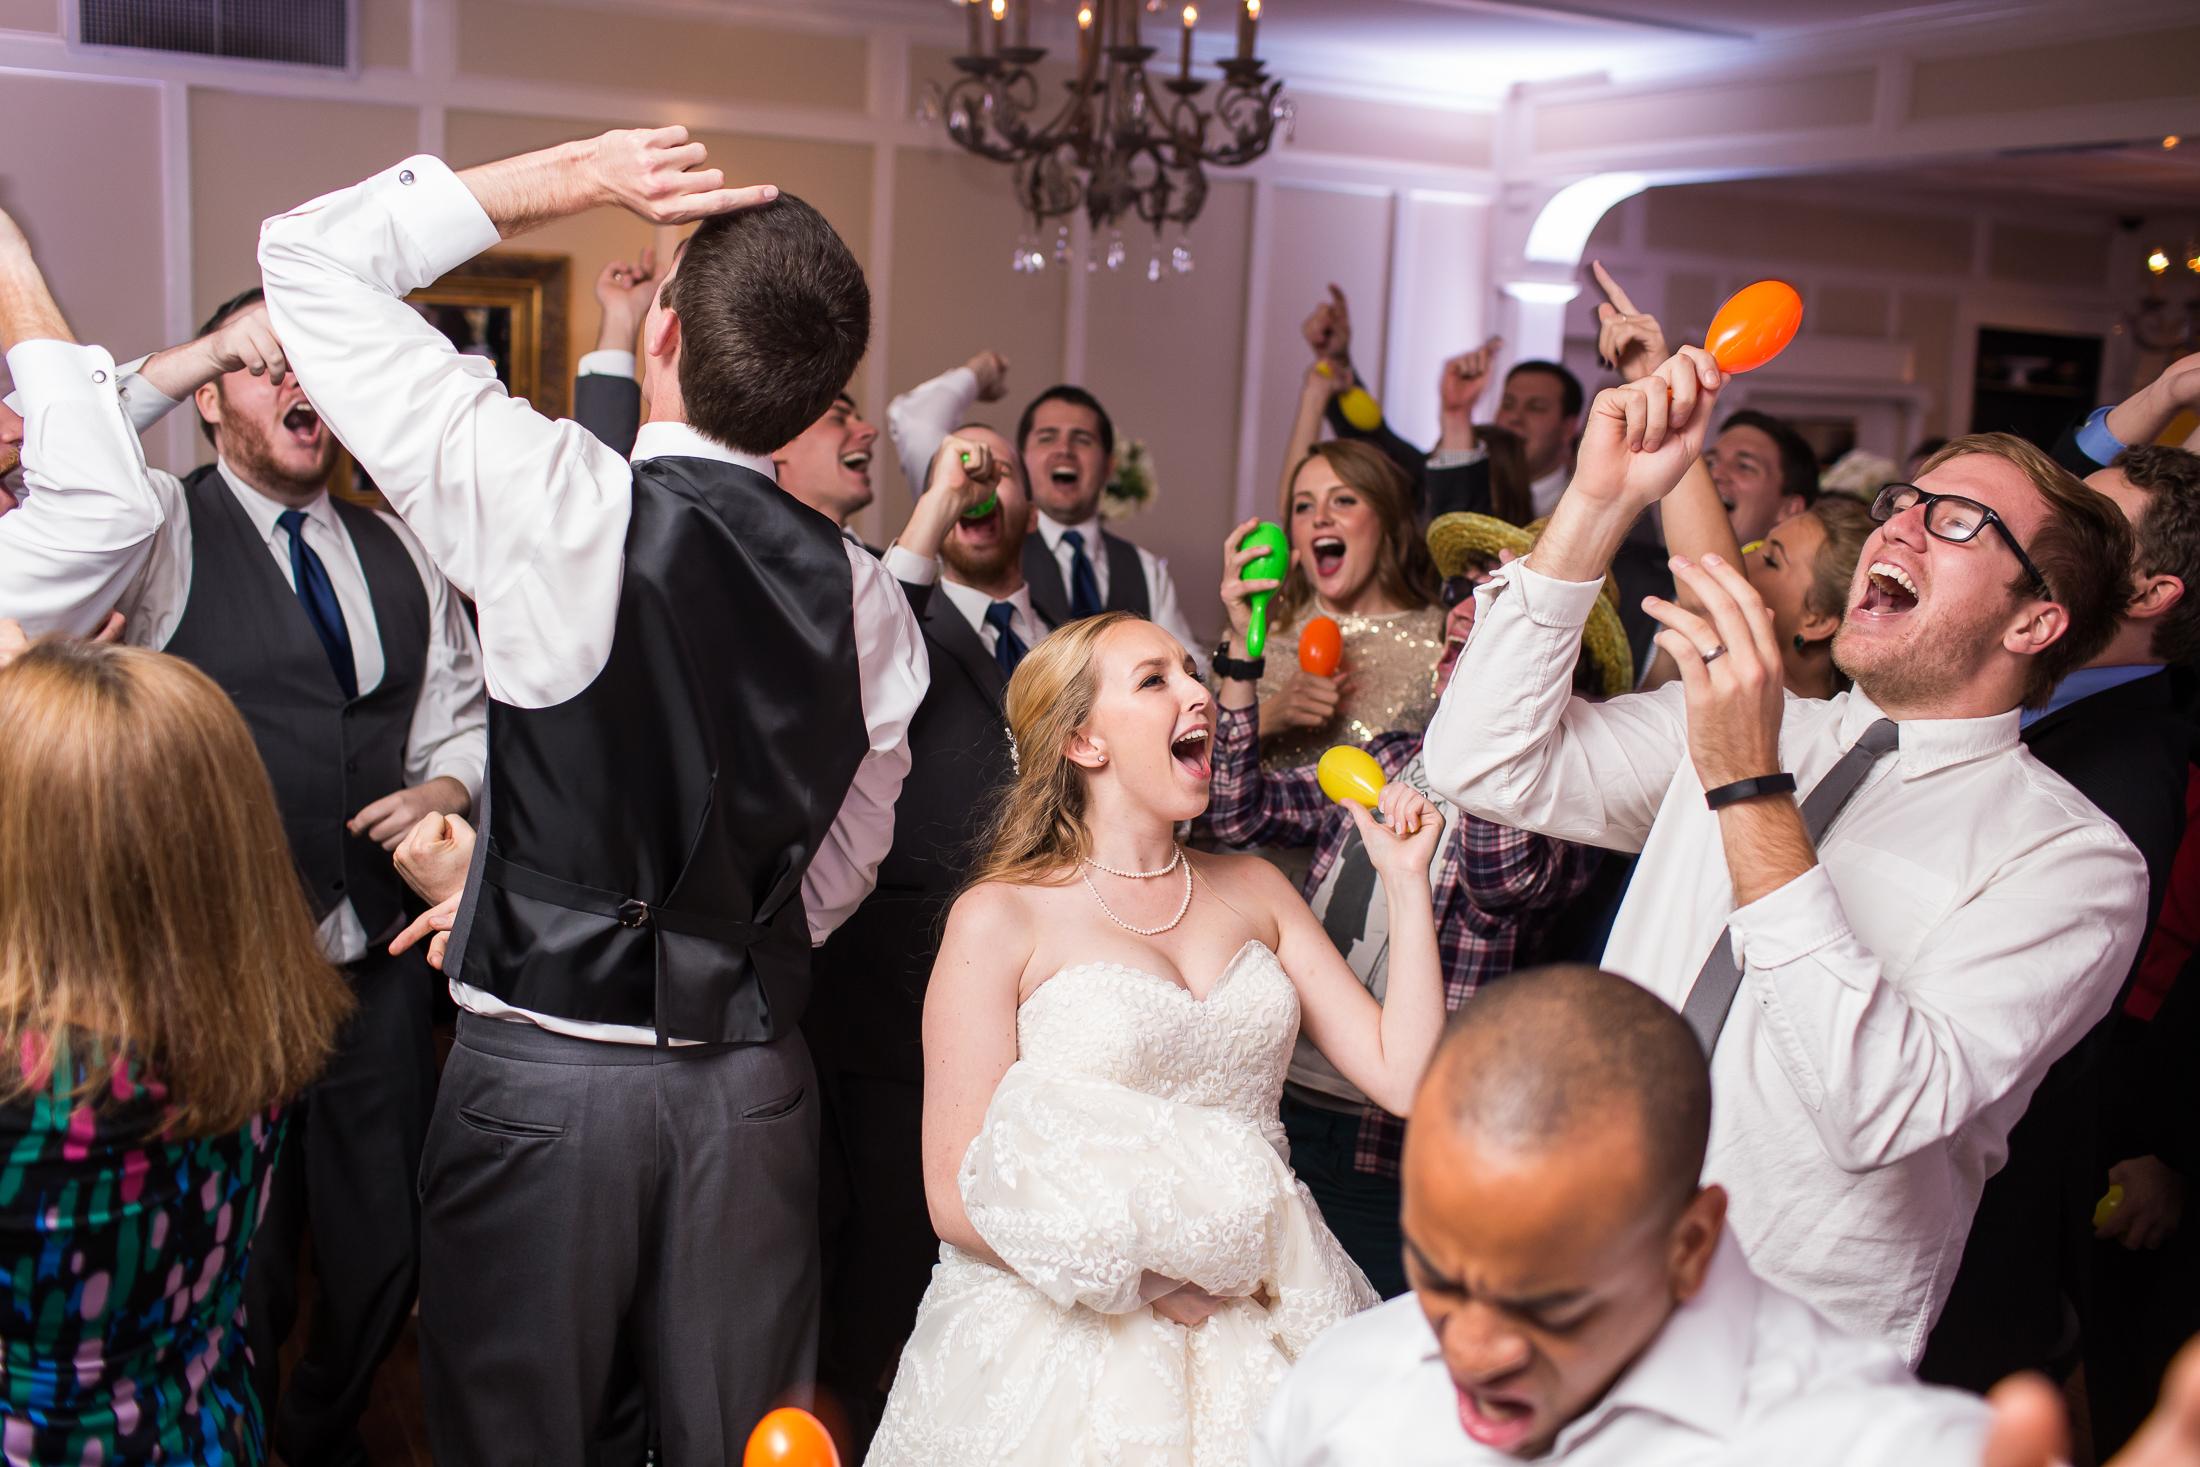 clairedianaphotography-wedding-payne-corley-house-122.jpg